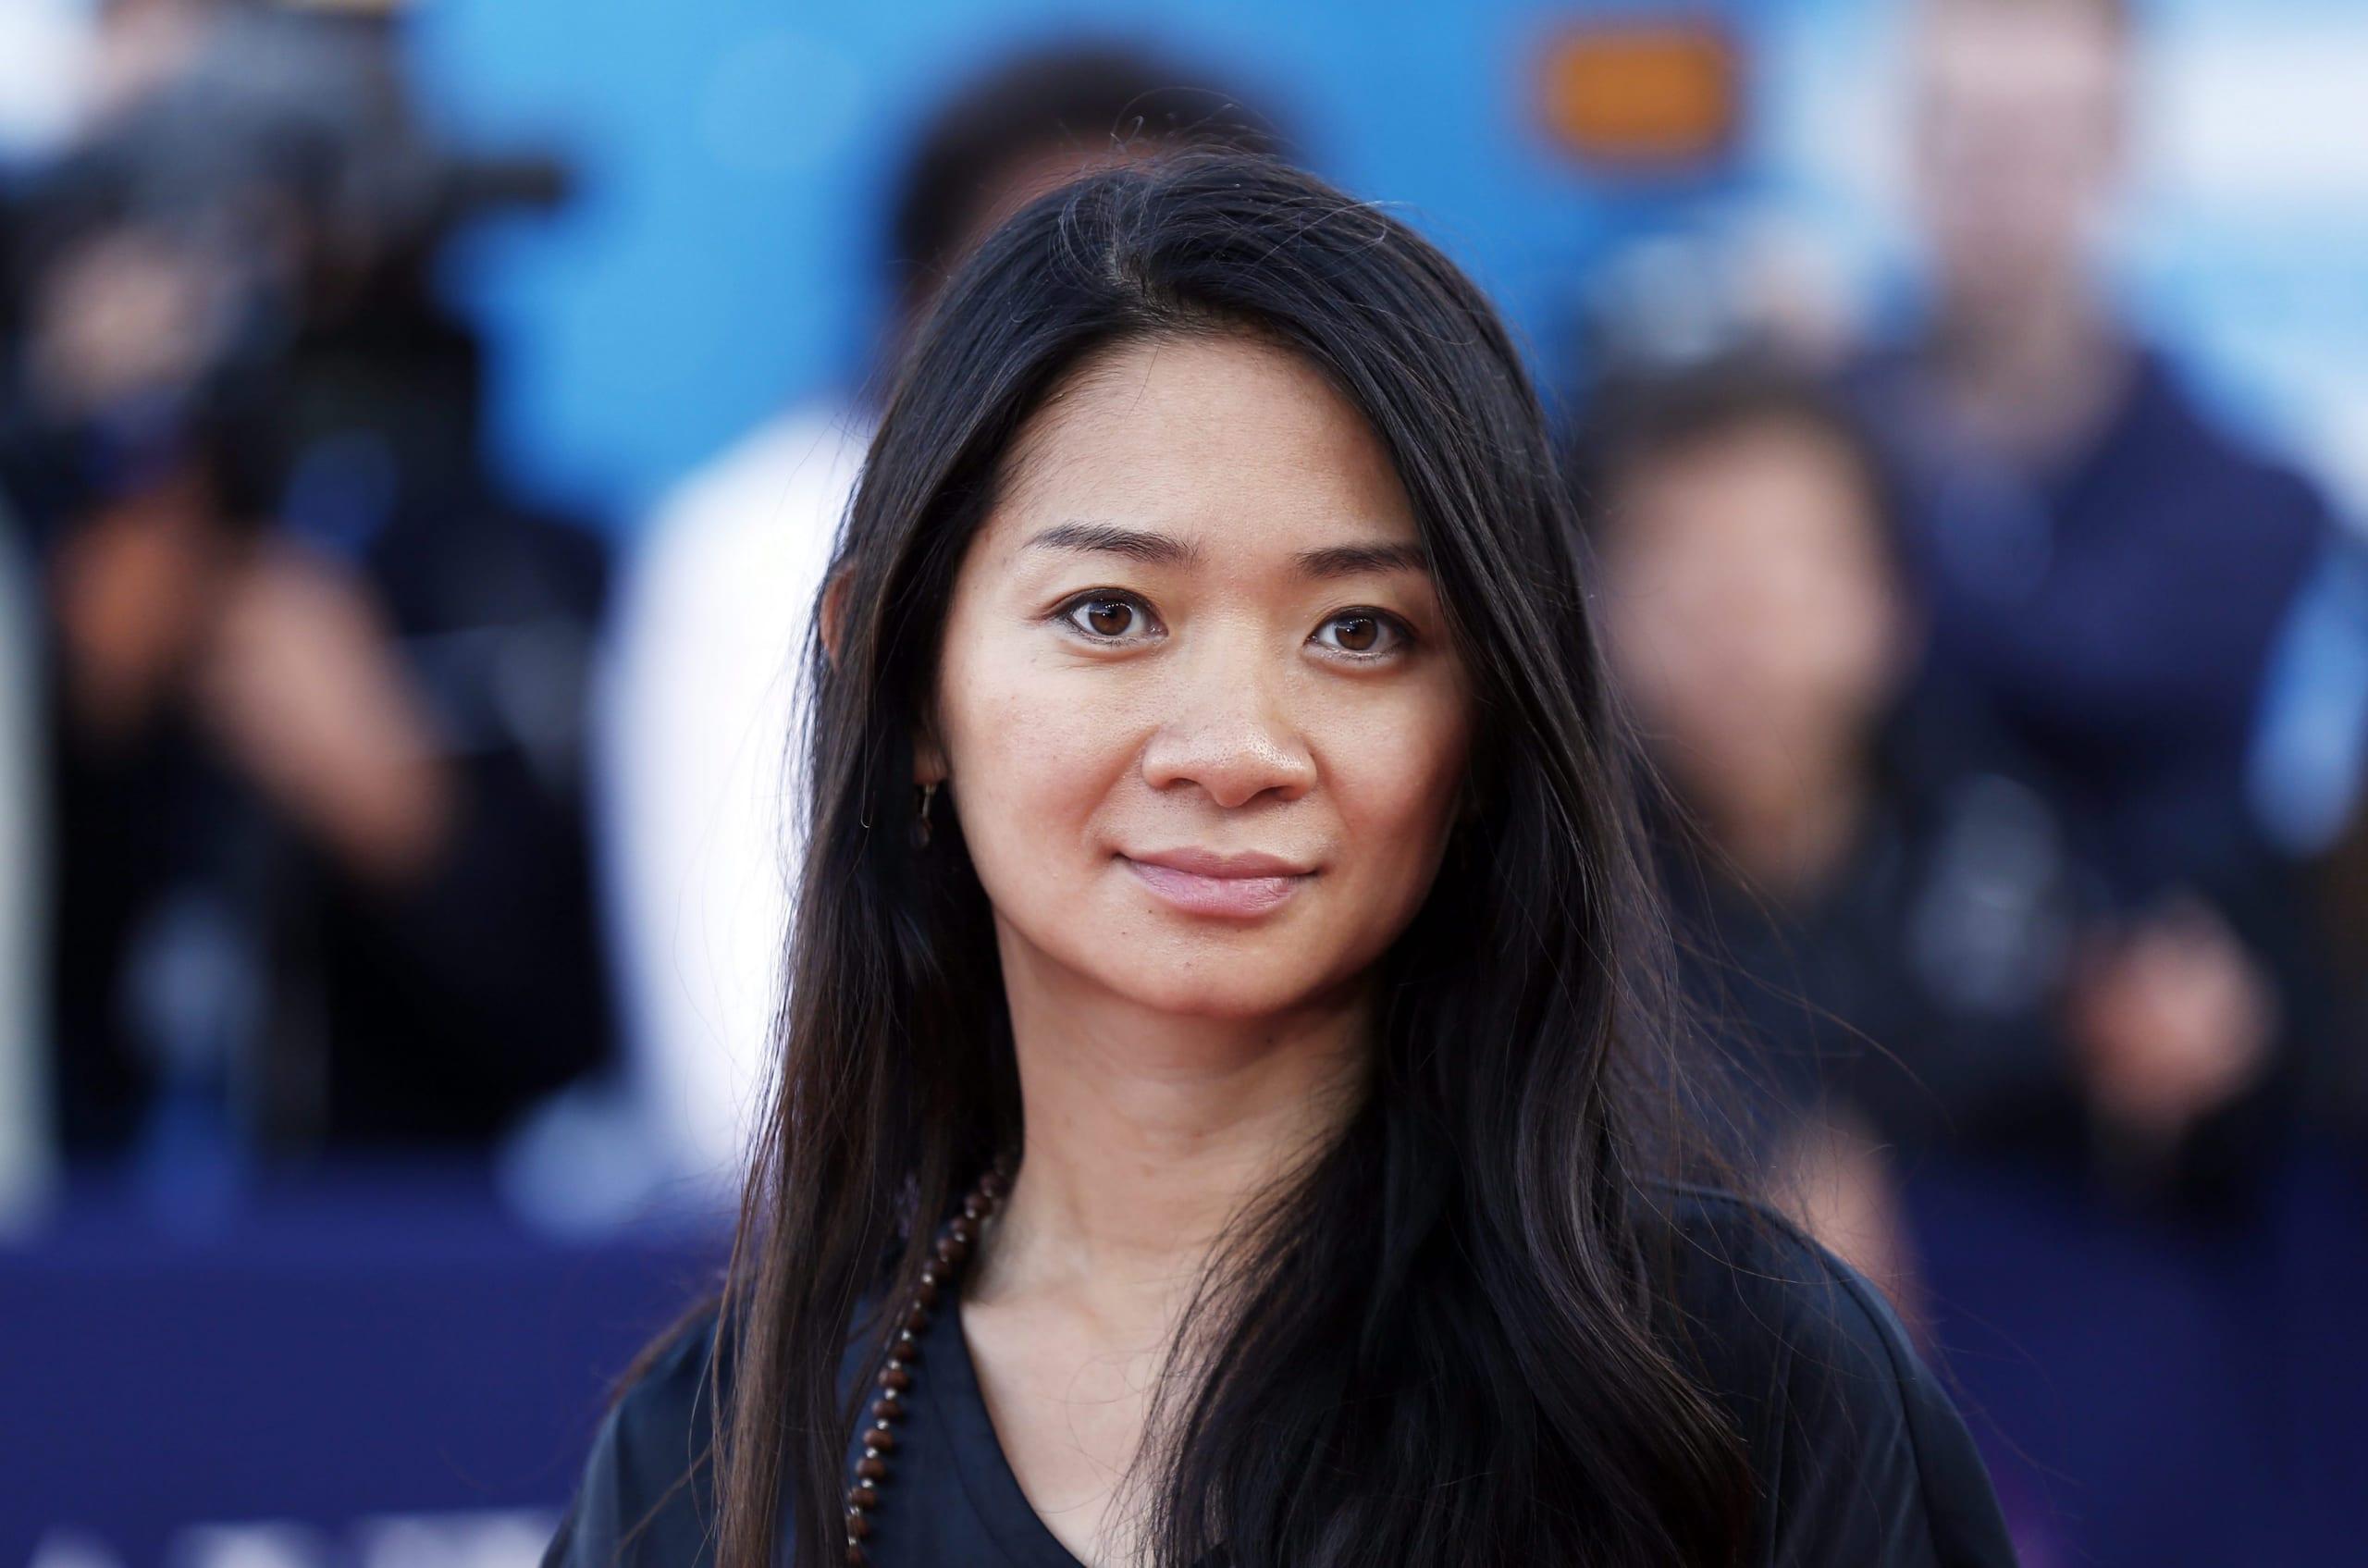 Dracula: Chloé Zhao dirigerà il film sci-fi western per la Universal